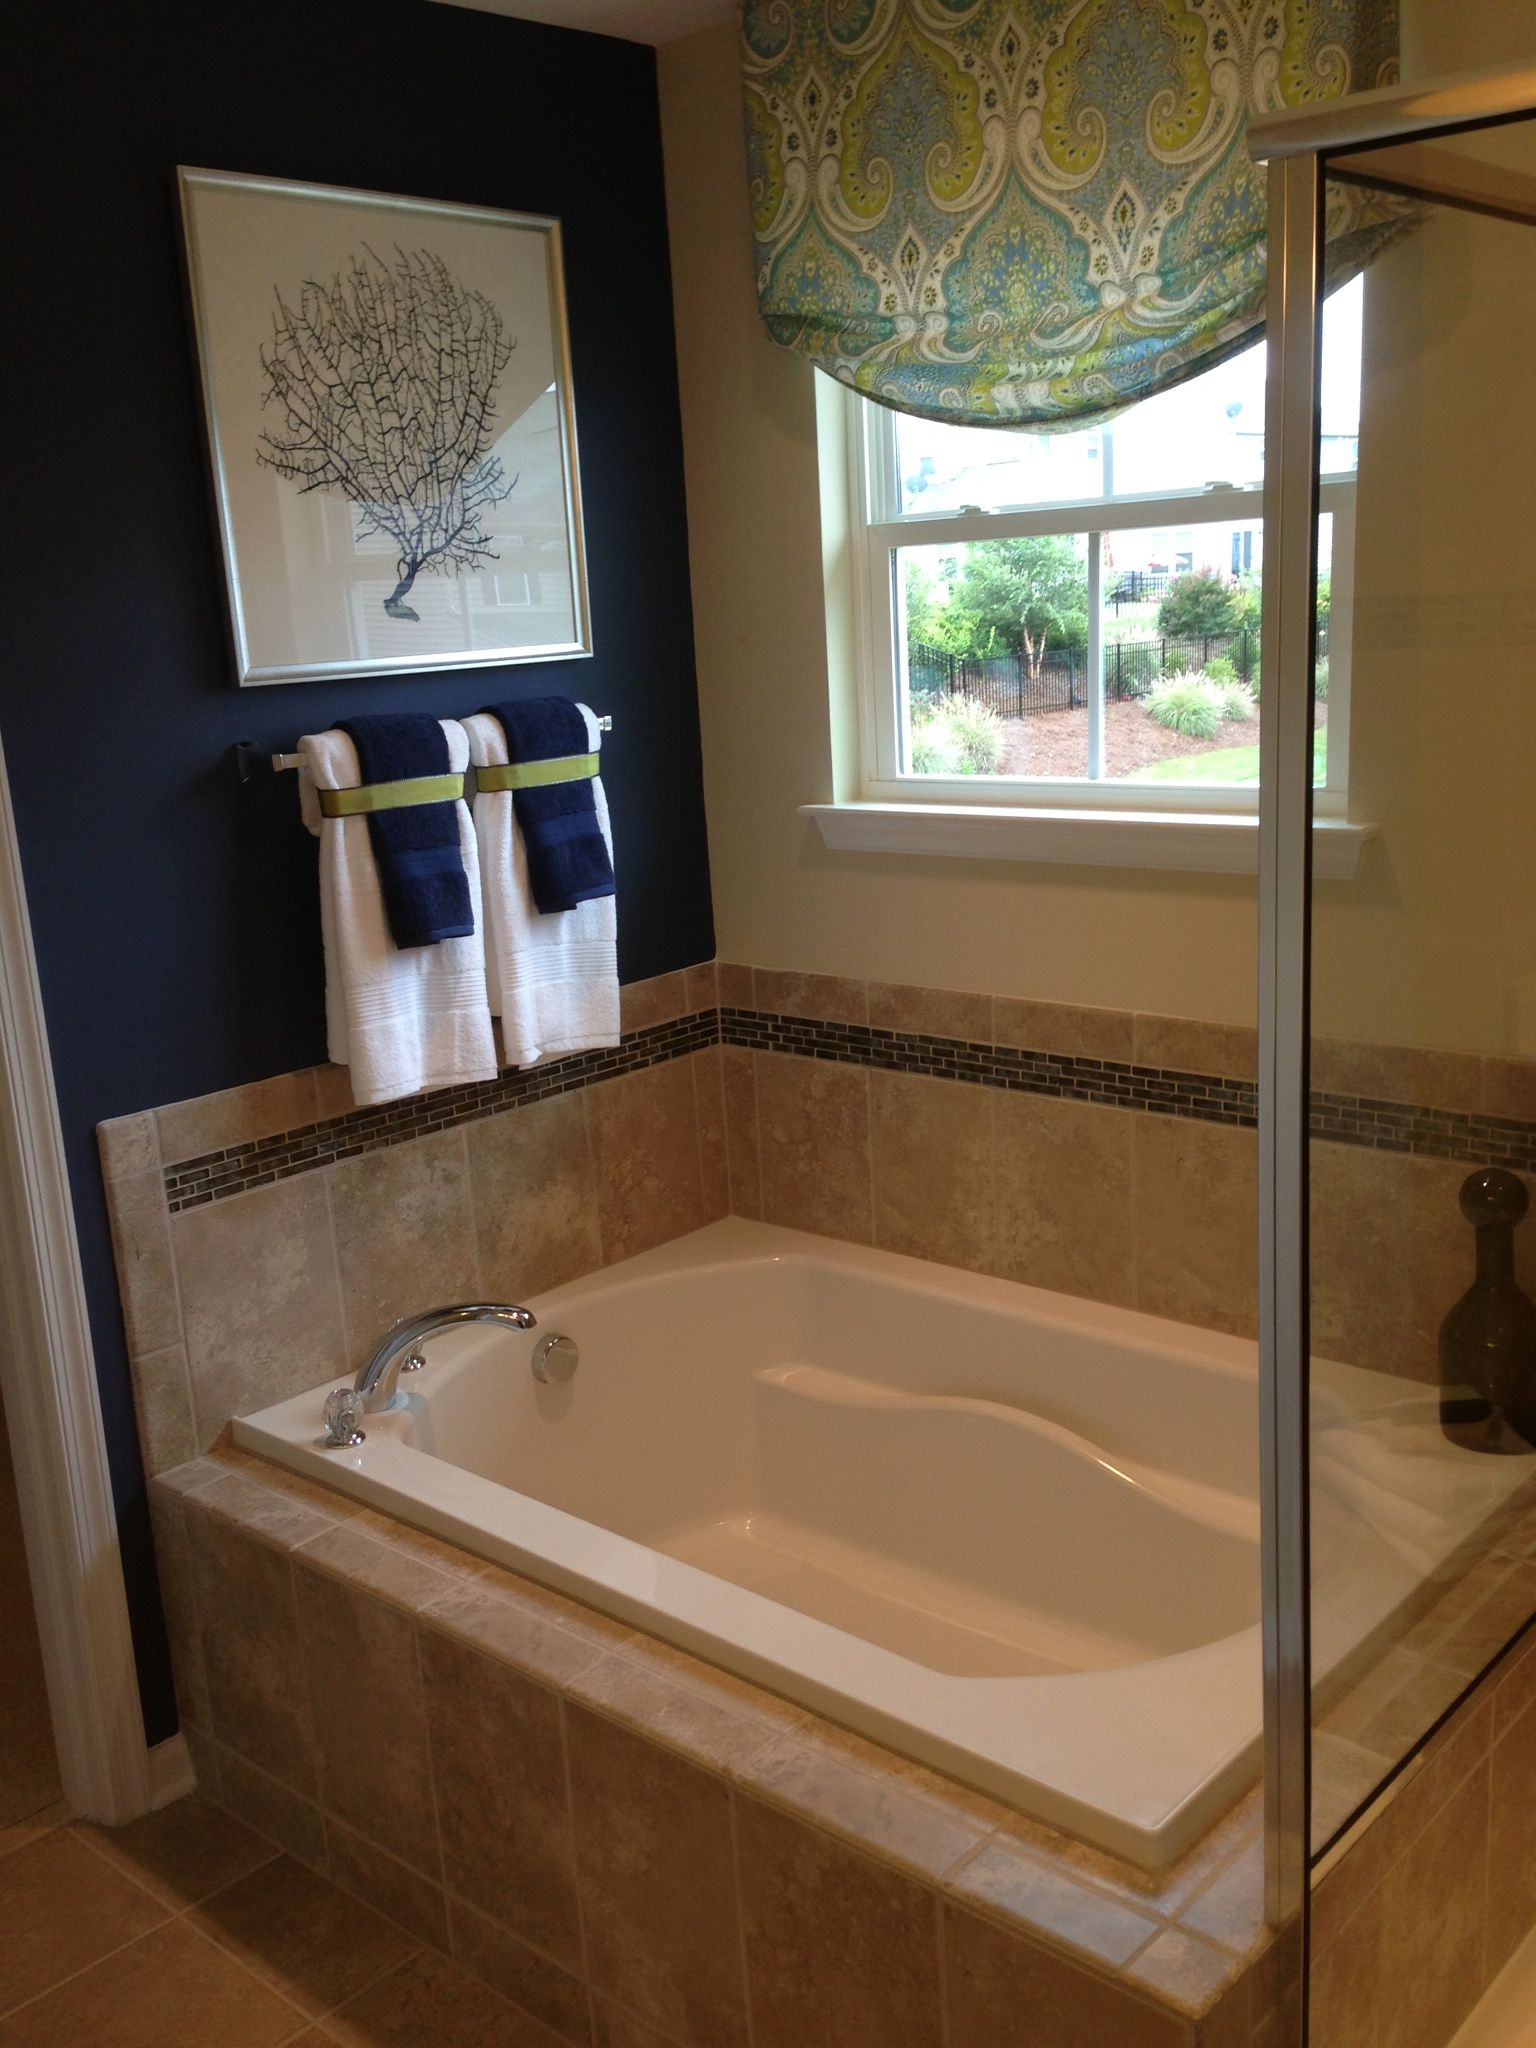 15 Genius Model Home Bathroom